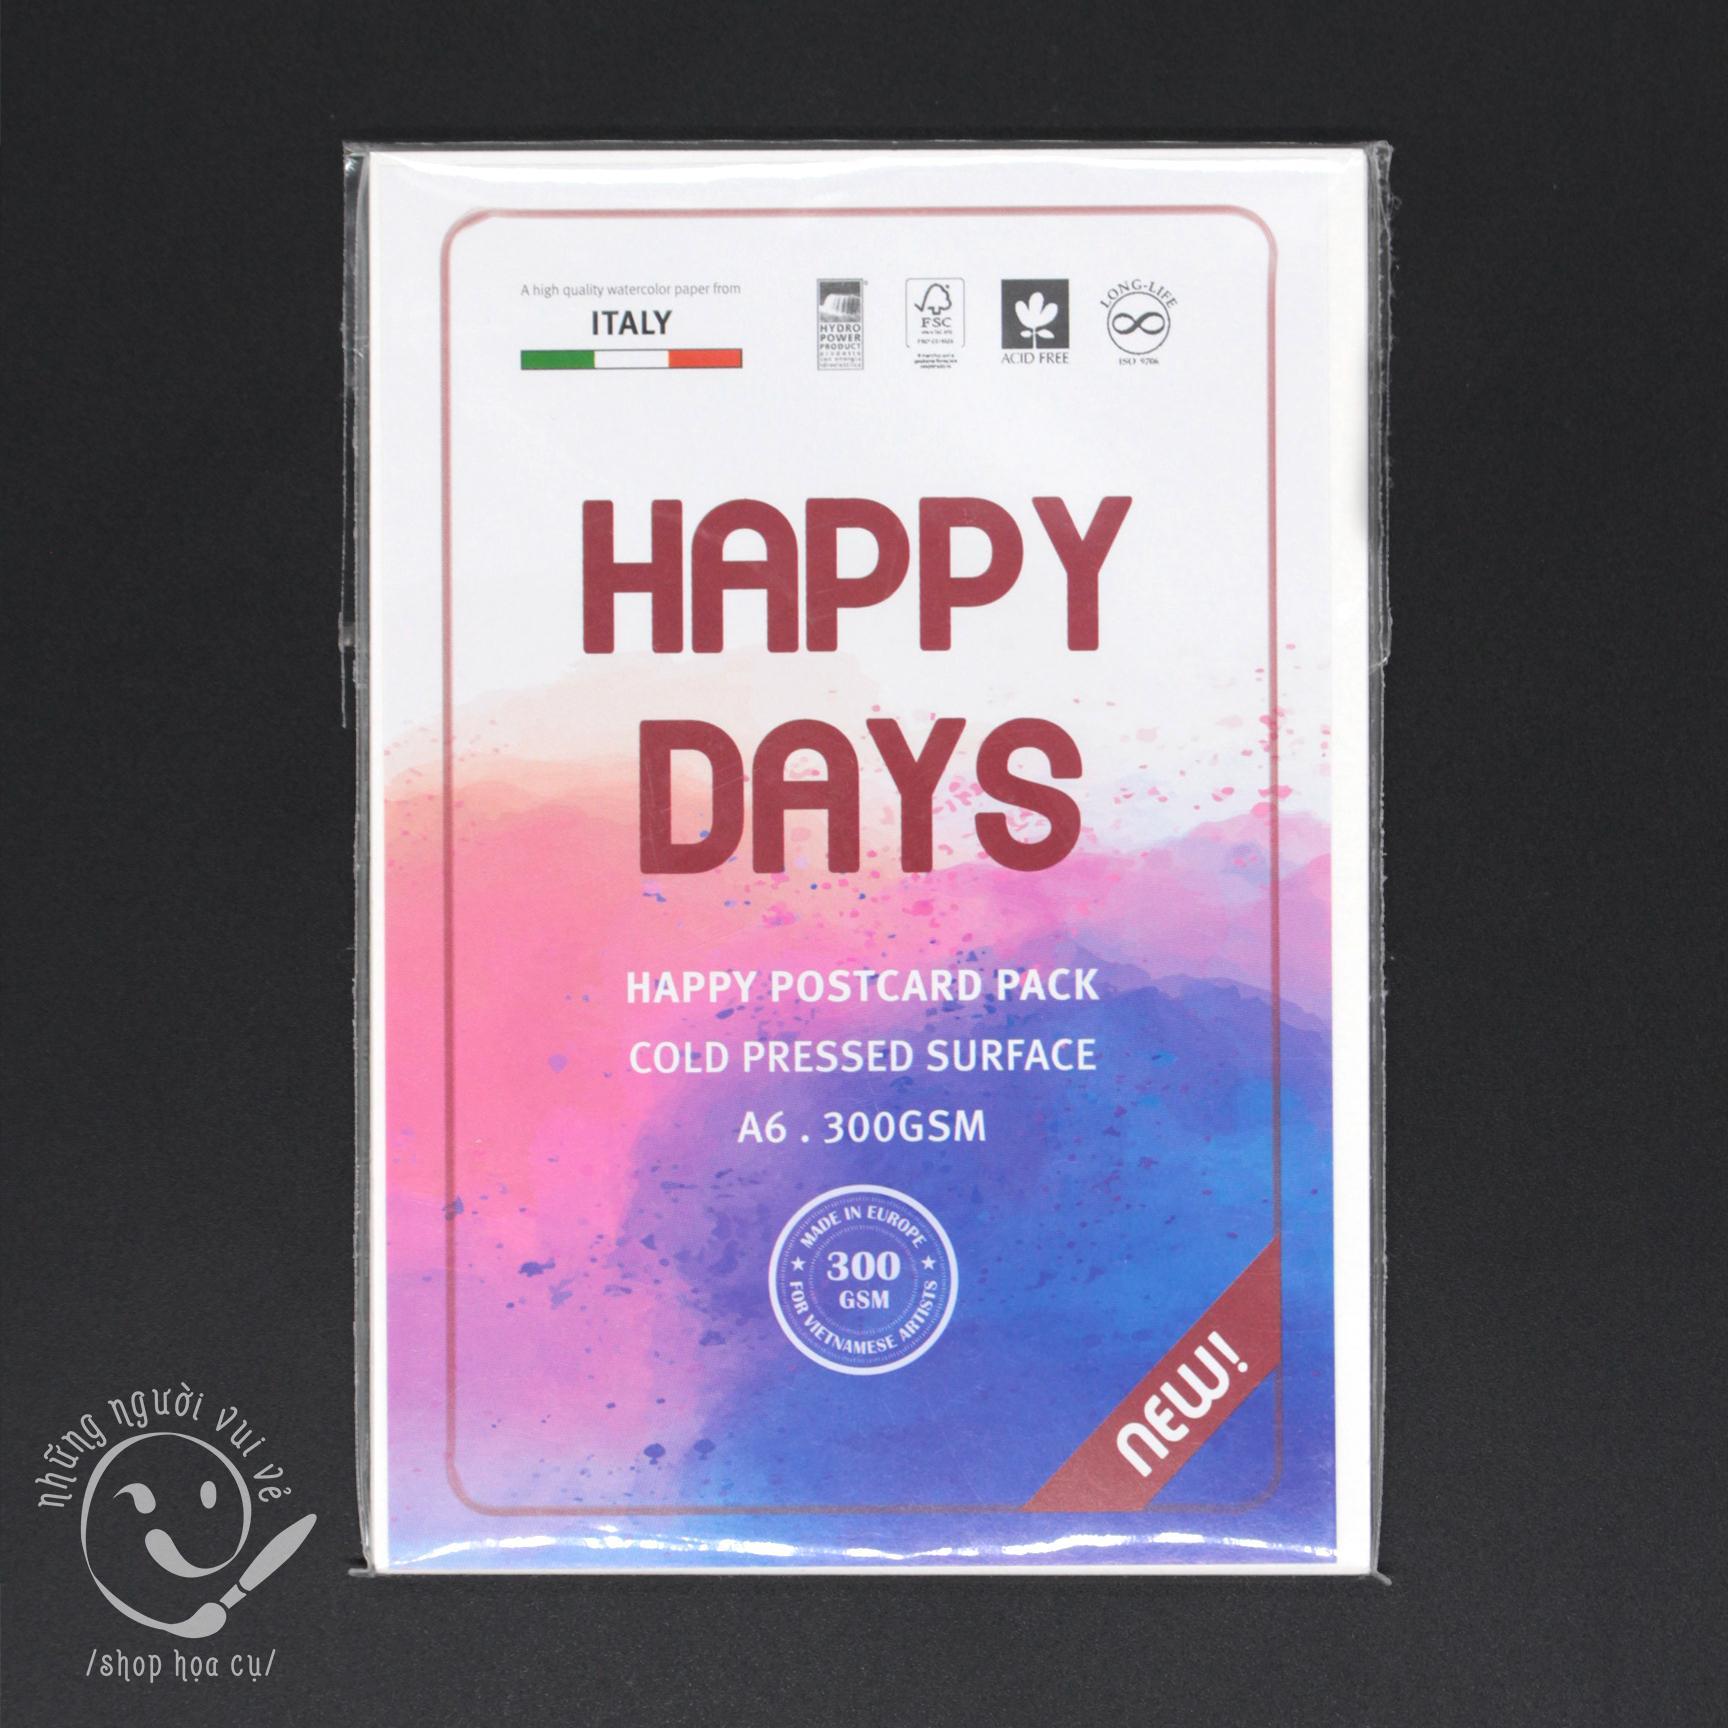 Mua Xấp giấy Happy dạng postcard